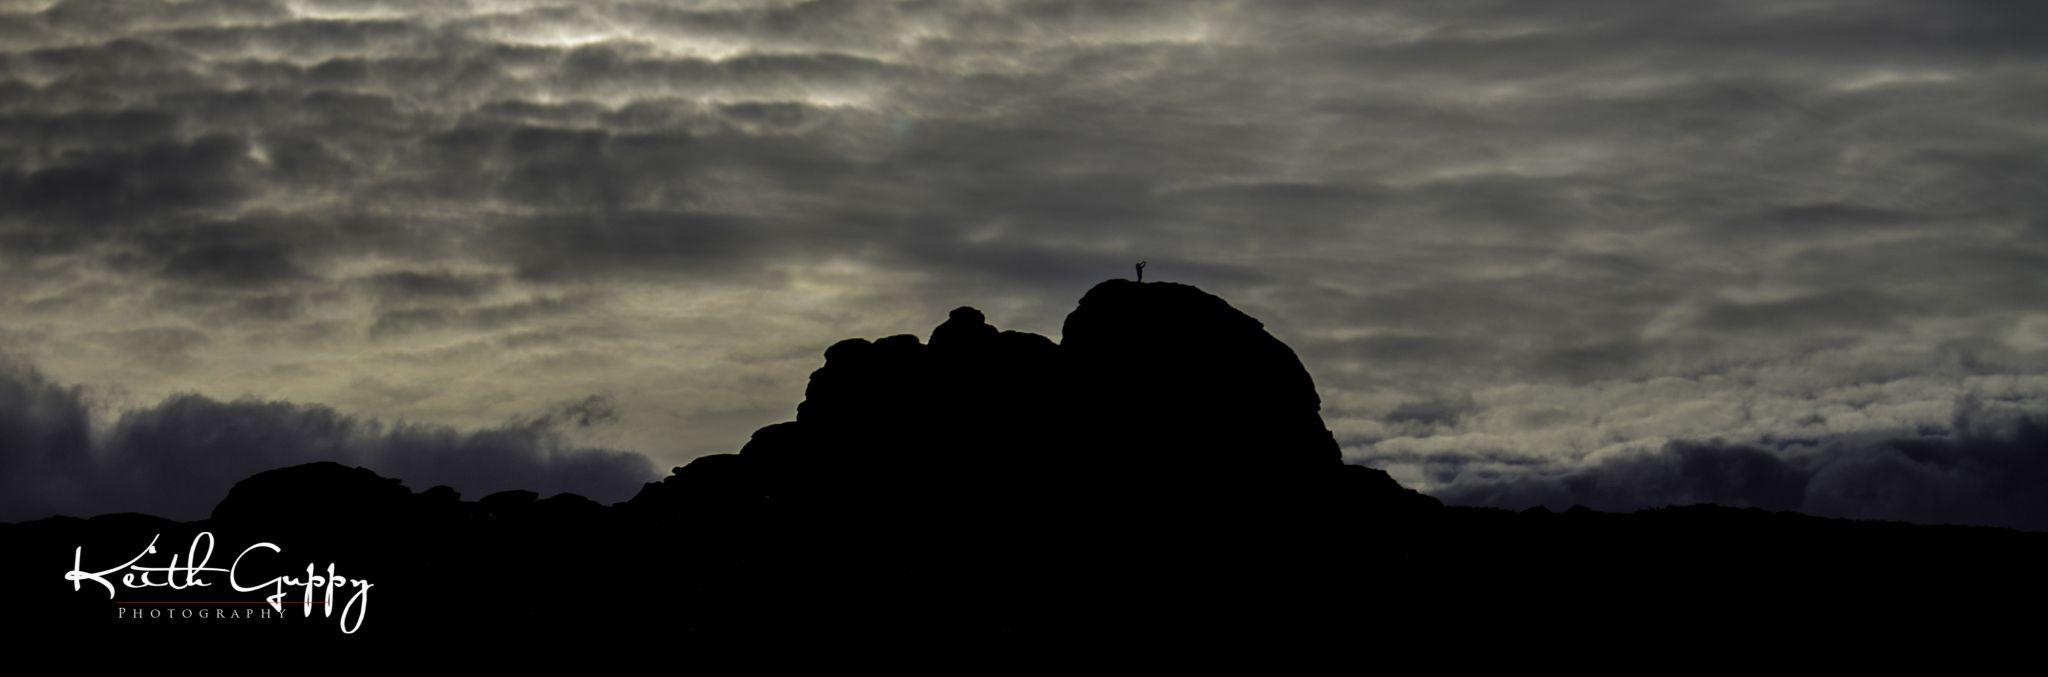 Haytor Rock, United Kingdom